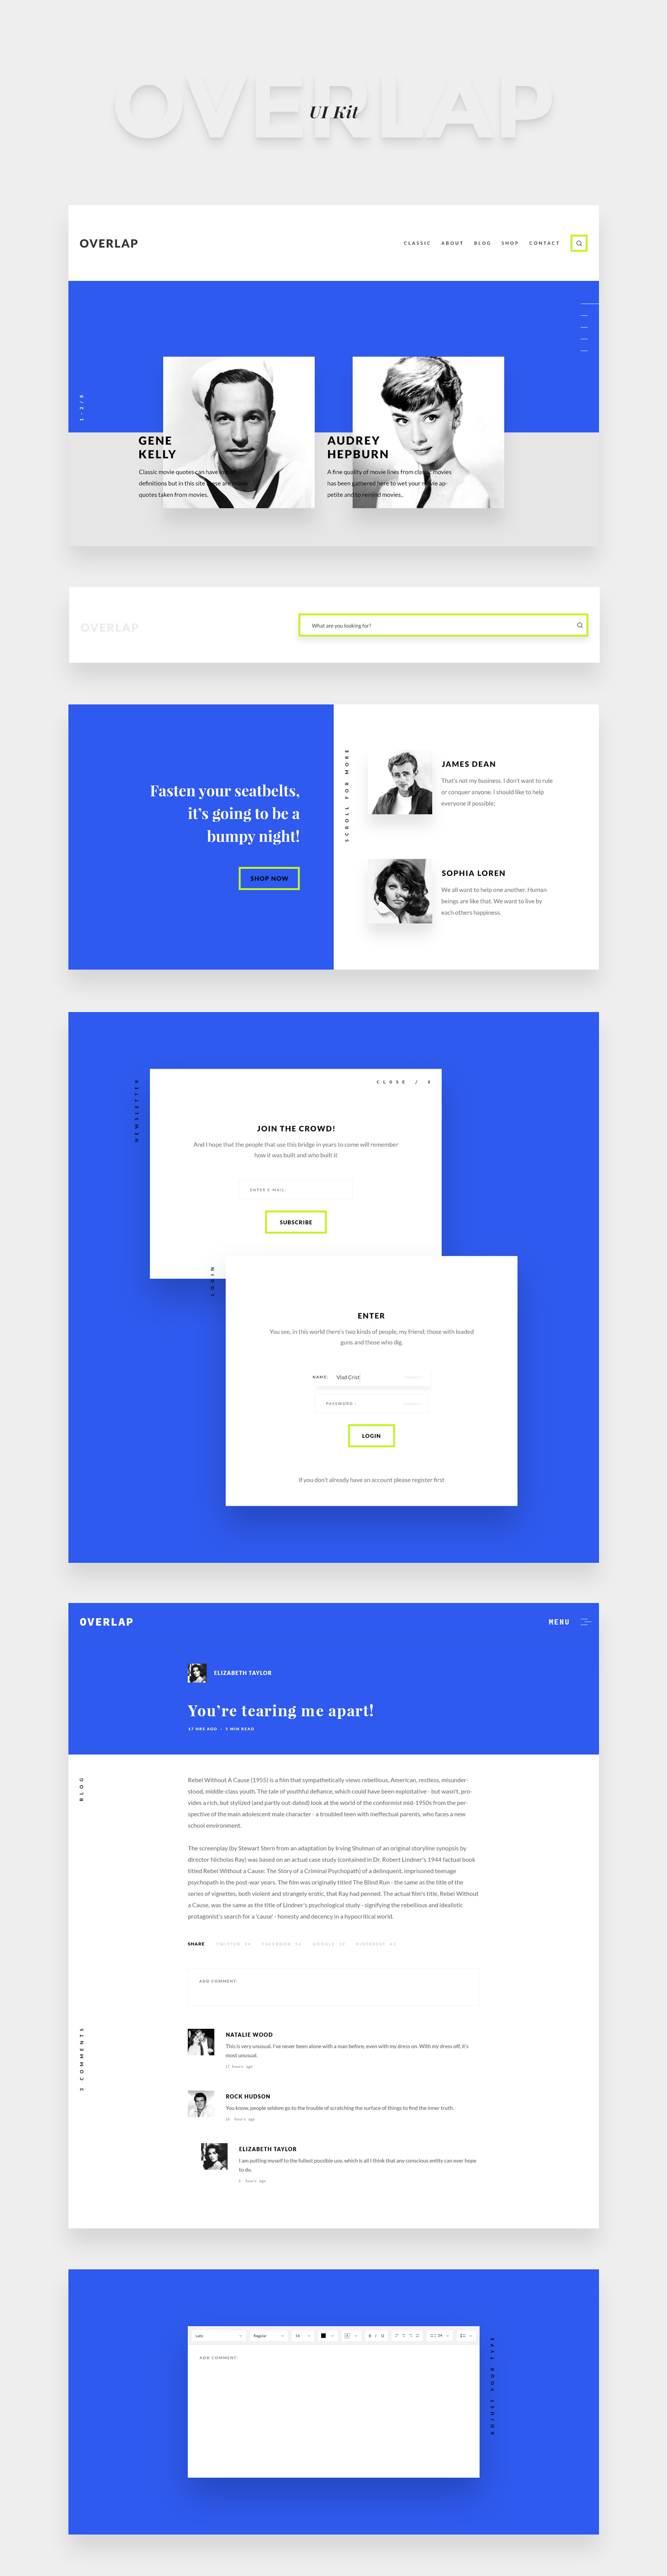 Blog UI ux free design Interface minimal concept blue trend Retro Webdesign page shadow flat